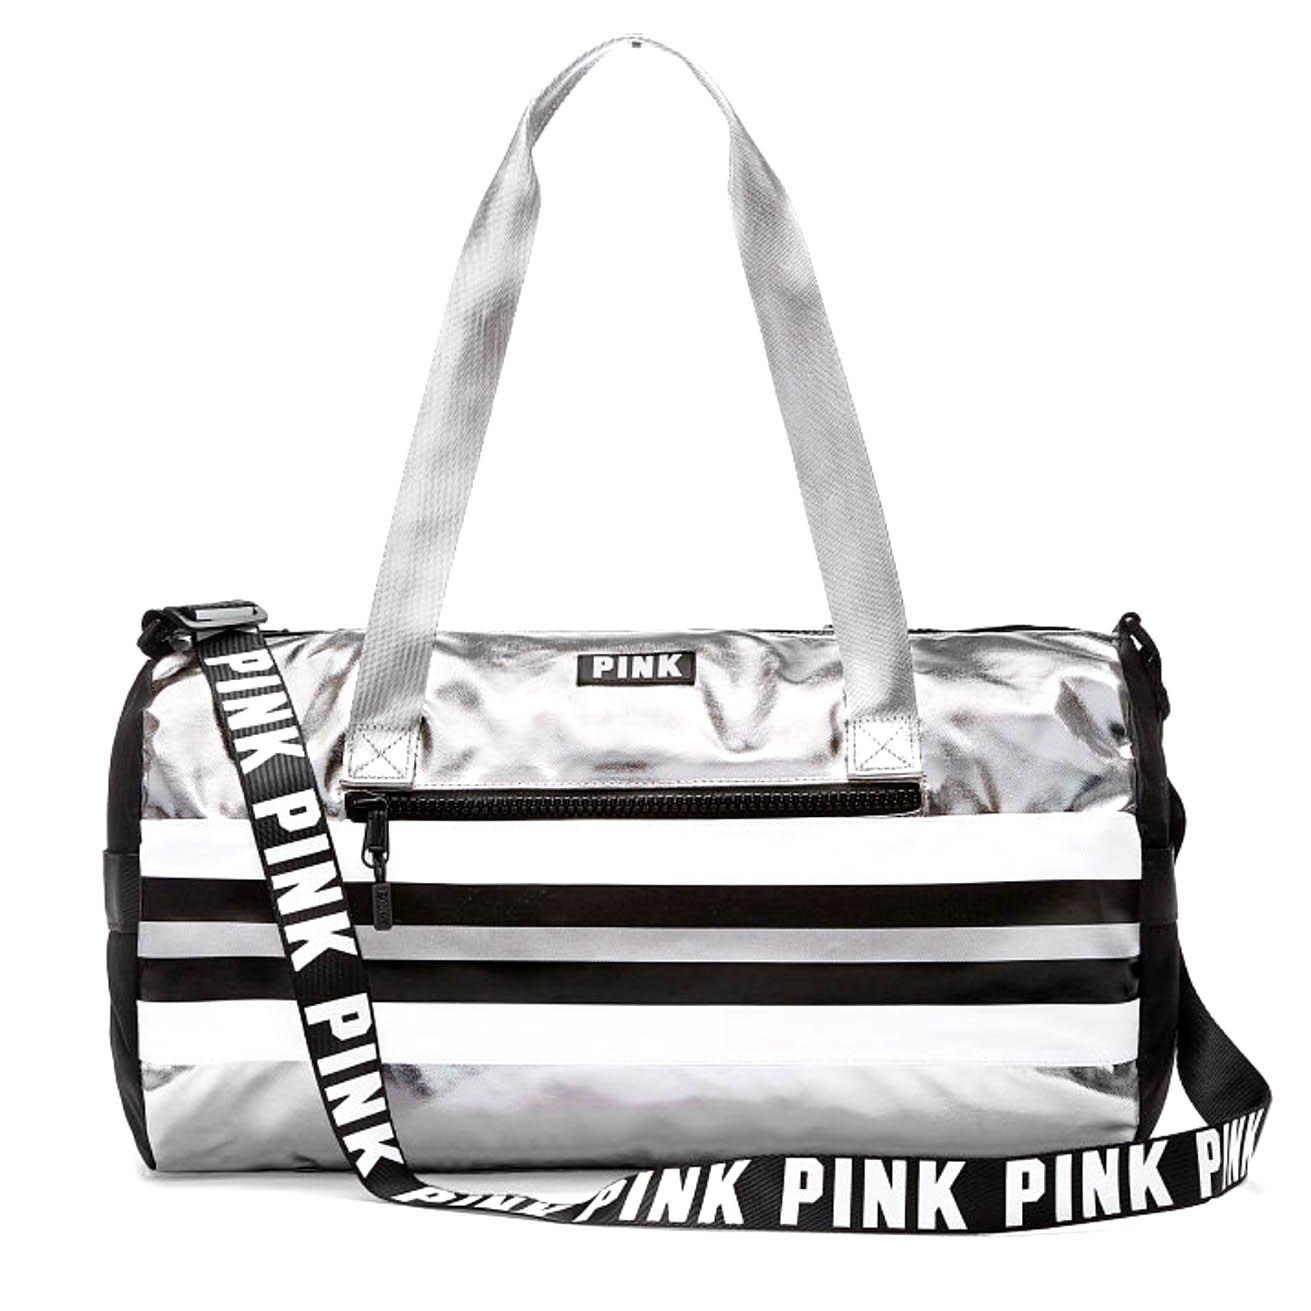 6a3b783970 80%OFF Victoria s Secret PINK SPORT MINI DUFFLE WEEKENDER GYM ...